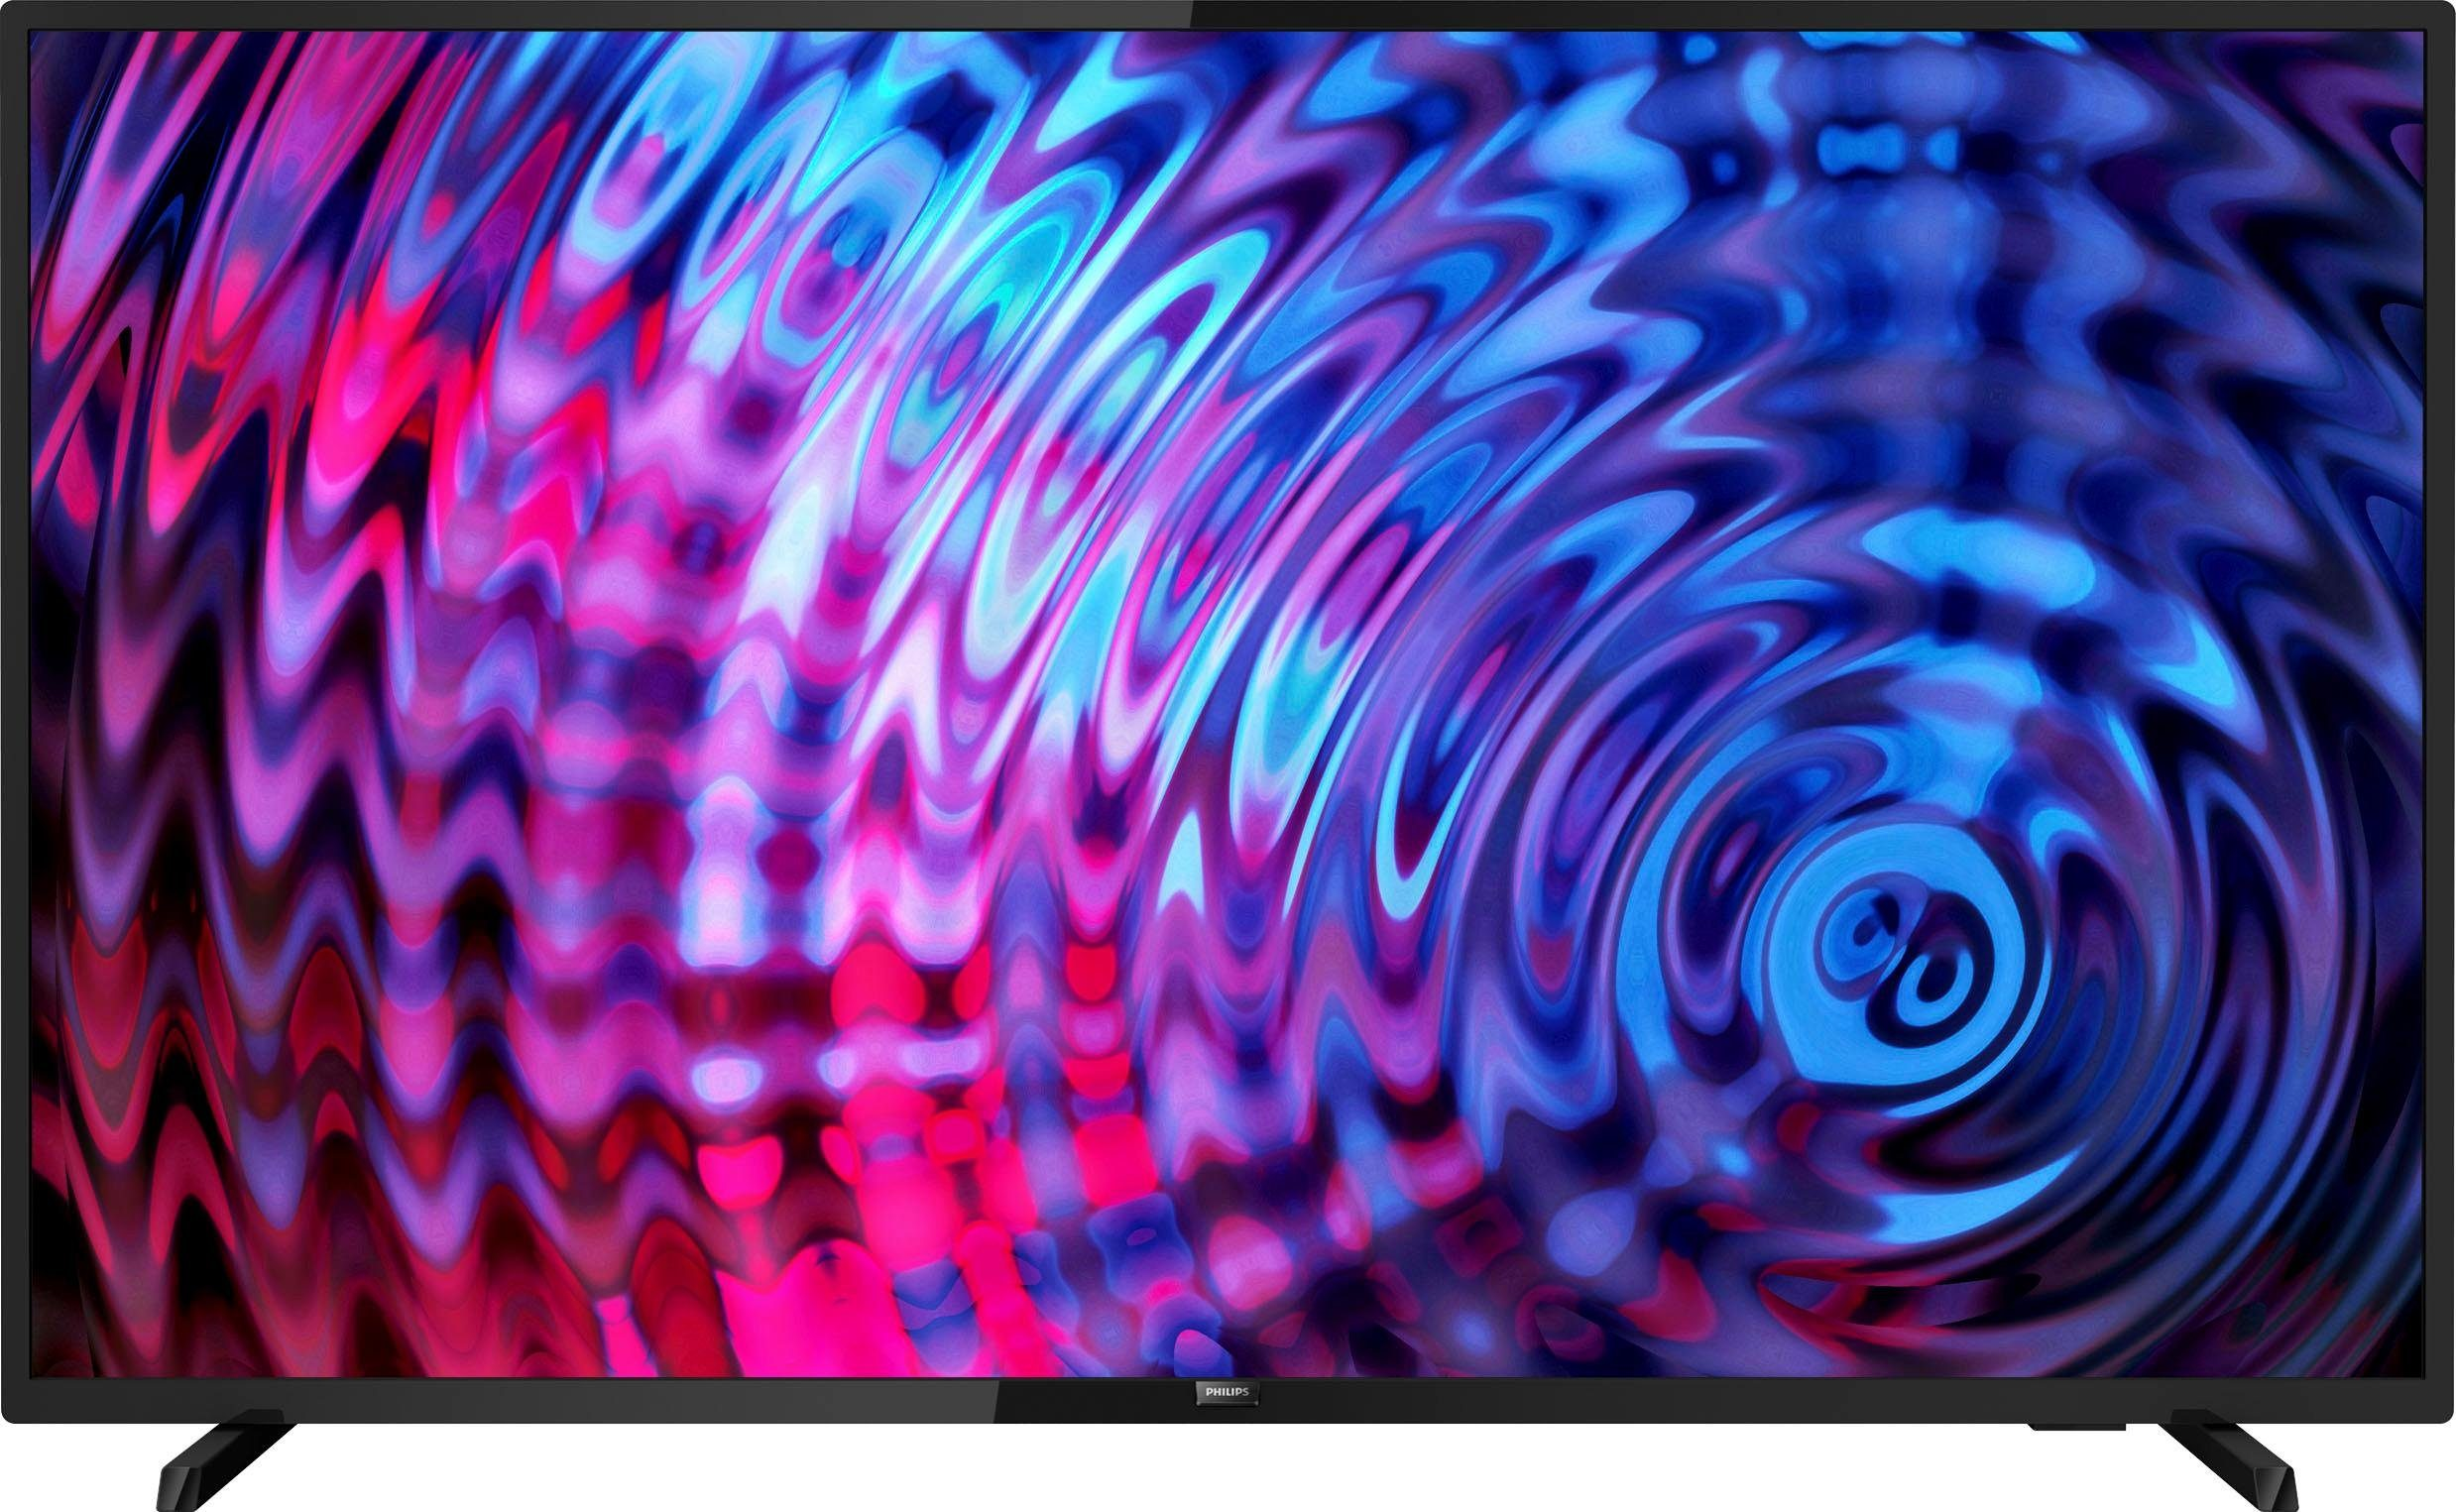 Philips 50PFS5503/12 LED-Fernseher (126 cm/50 Zoll, Full HD, USB-Recording)